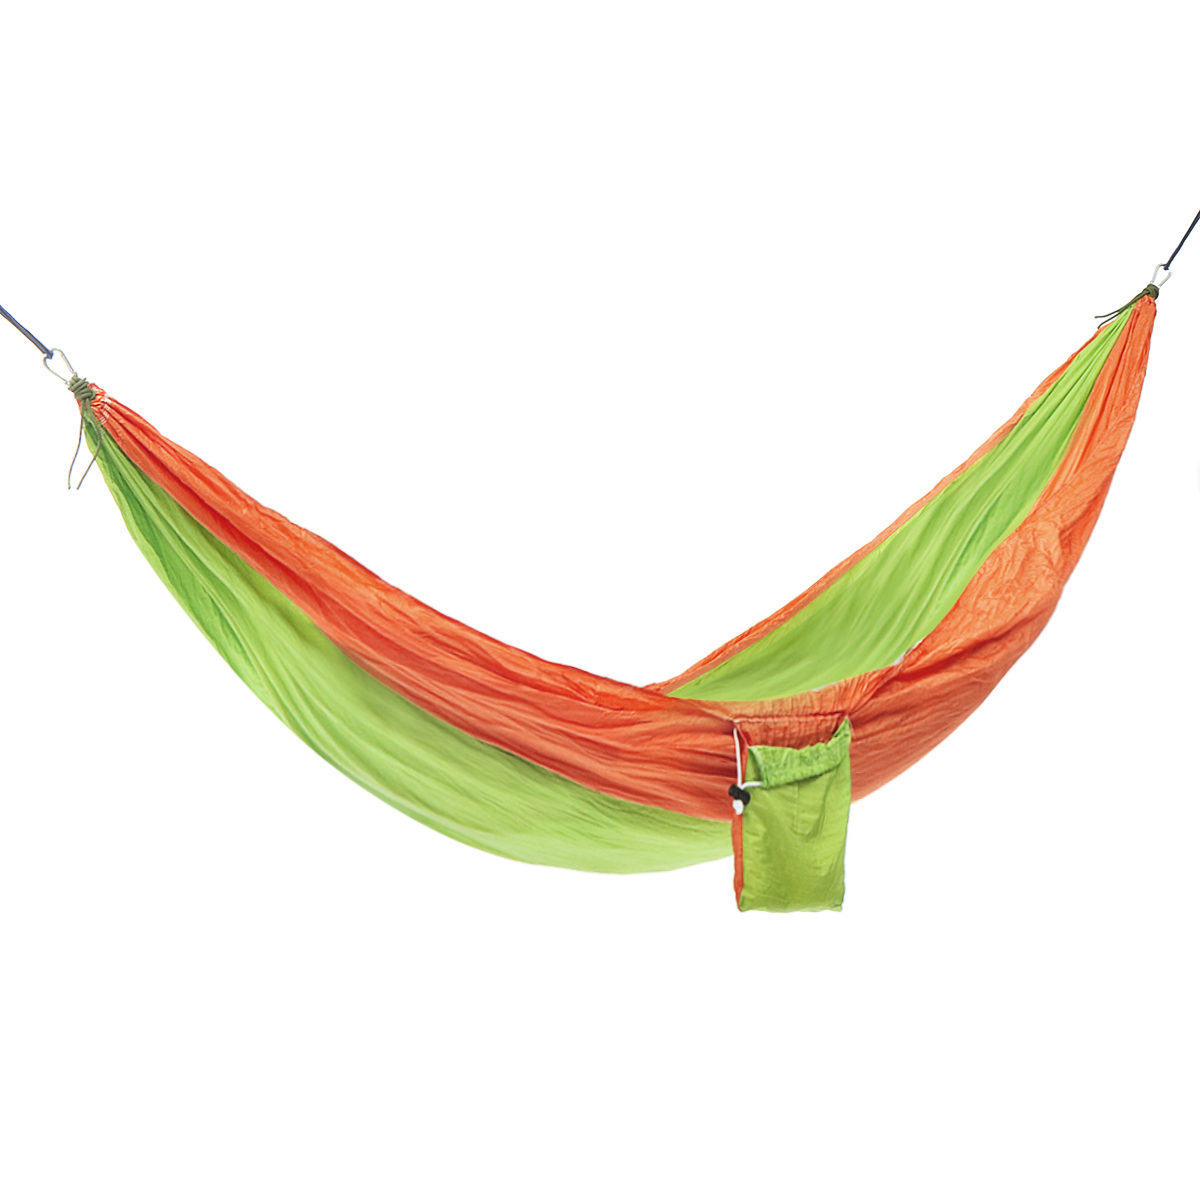 Double Camping Parachute Hammocks With 2 Straps 2 Carabin Survival Garden Outdoor Furniture Leisure Sleeping Bed Travel Hammocks